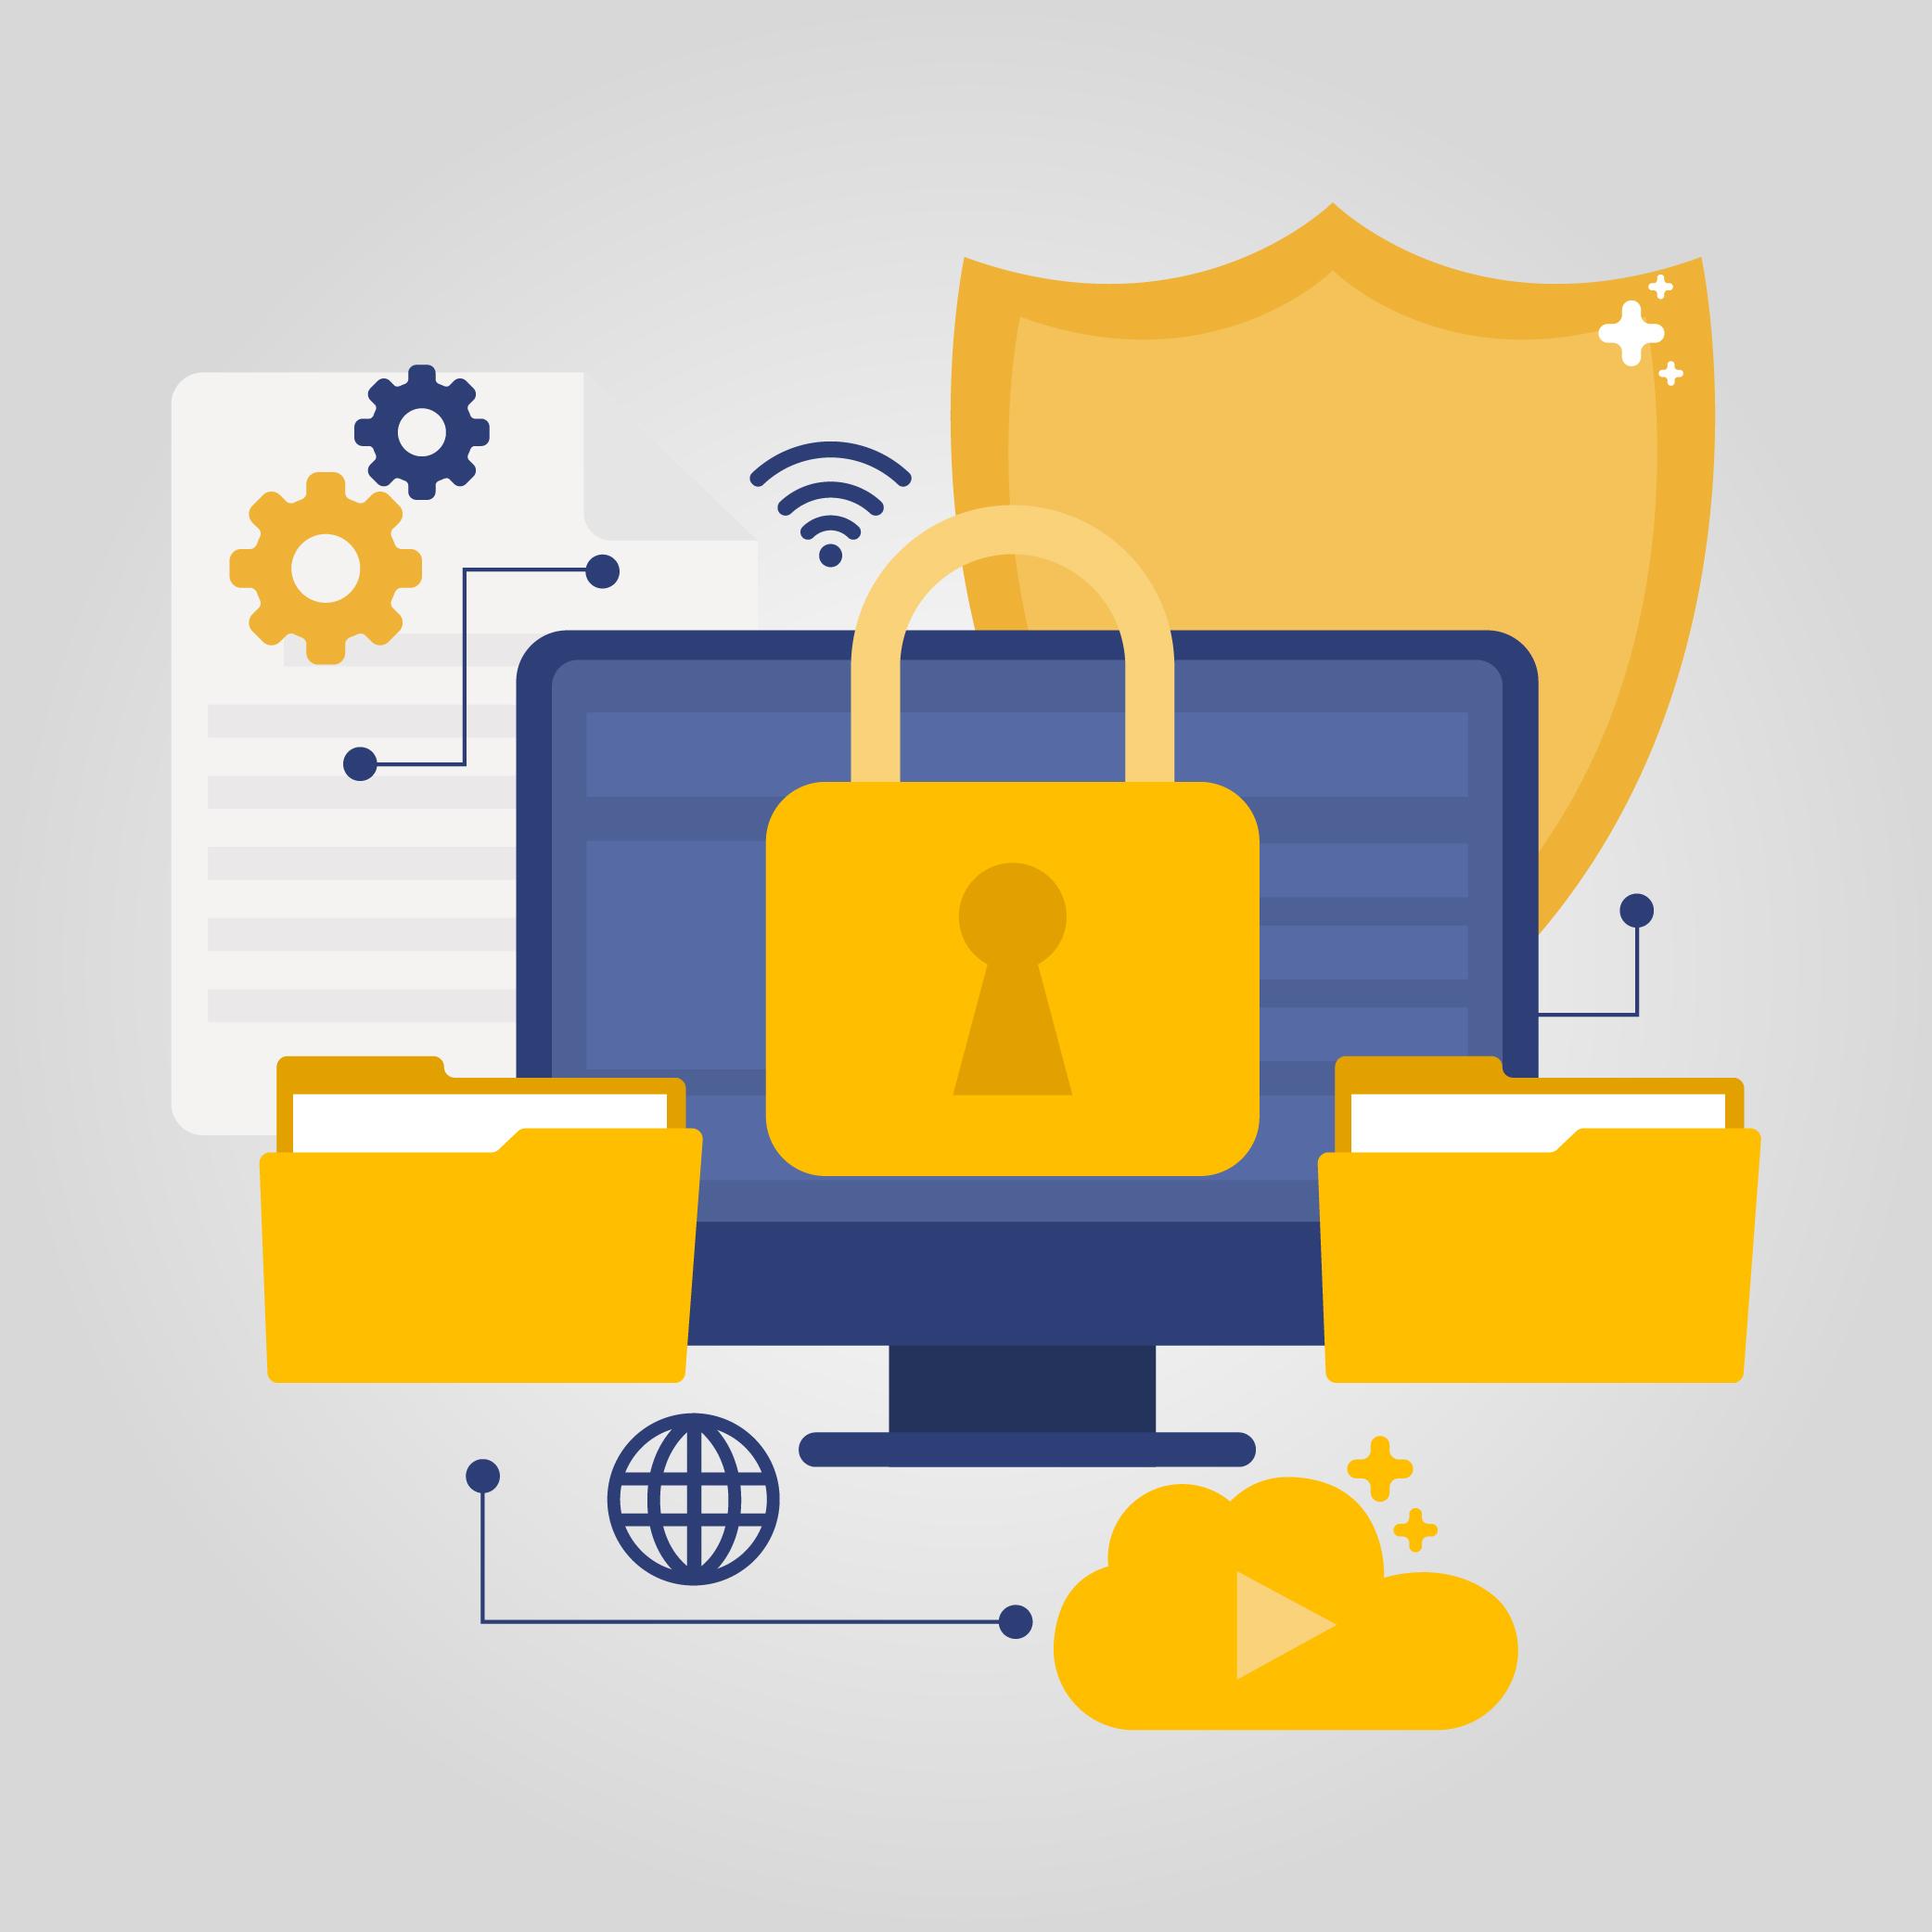 Web Security Image